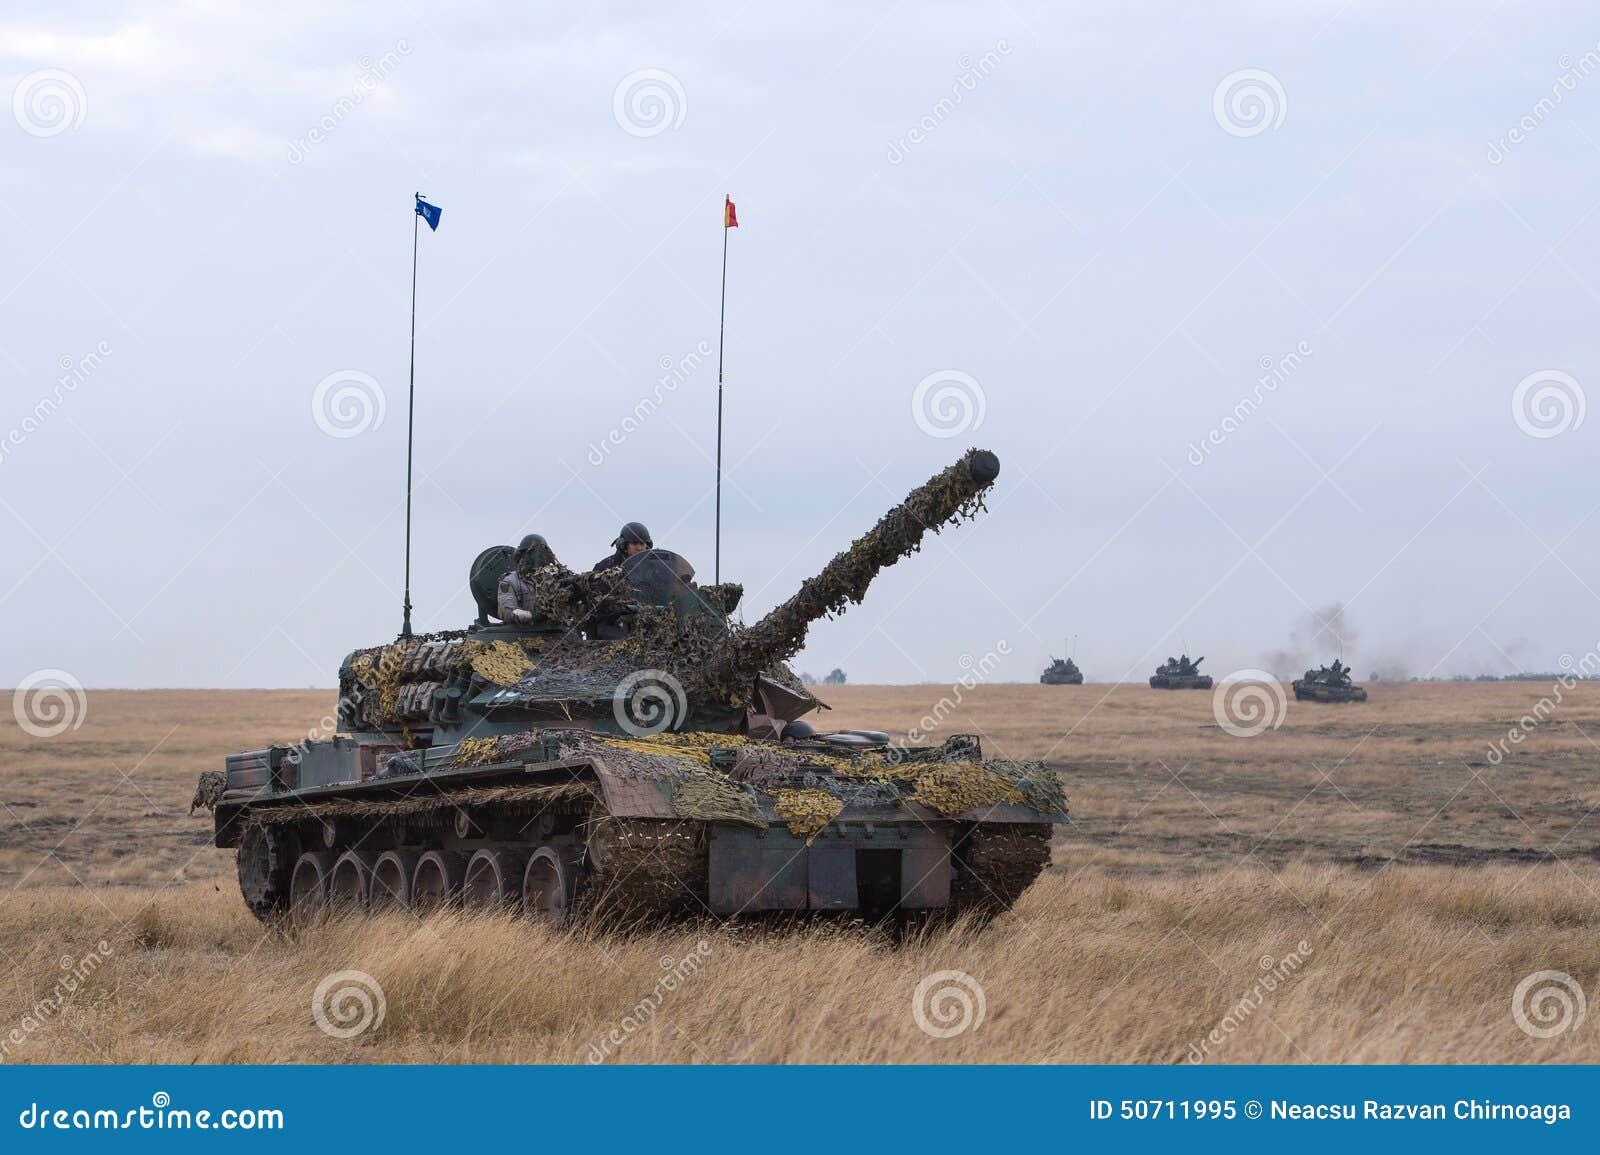 Romanian Tank TR 85M \u0027Bizonul\u0027 Editorial Image - Image of camouflage